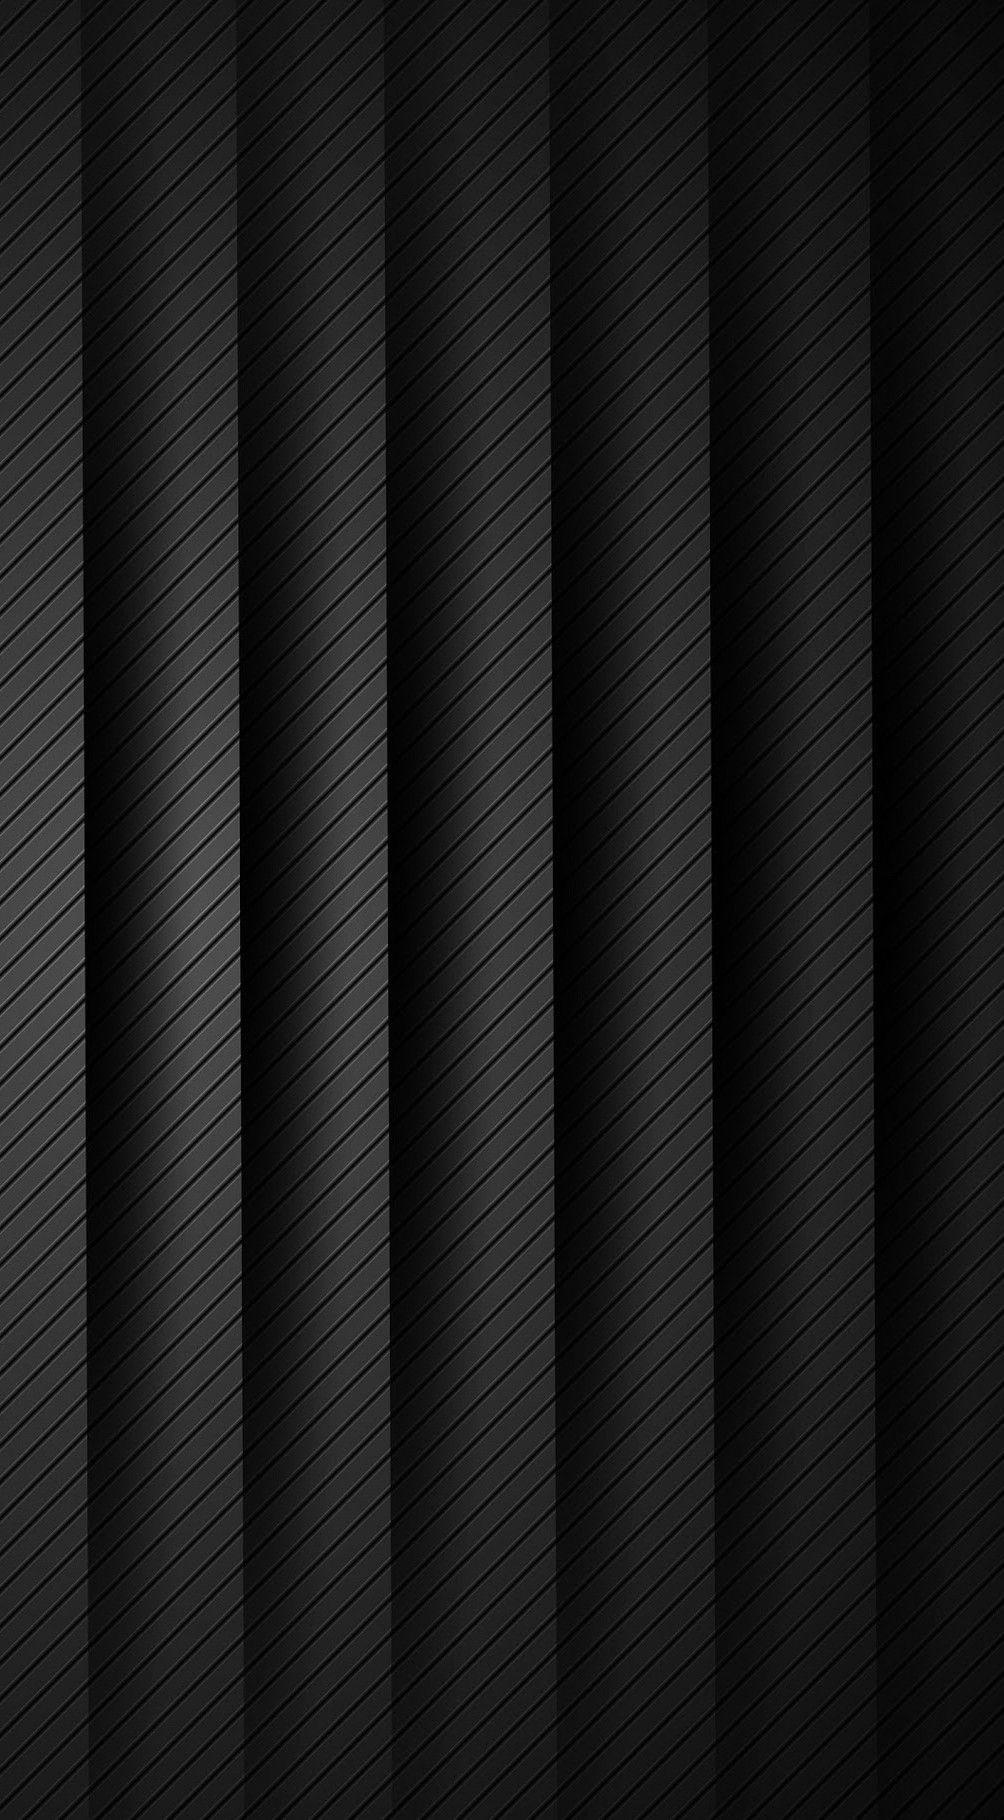 Pin By Zryan On Wallpaper Phone Desktop Wallpaper Design Color Wallpaper Iphone Black Wallpaper Iphone